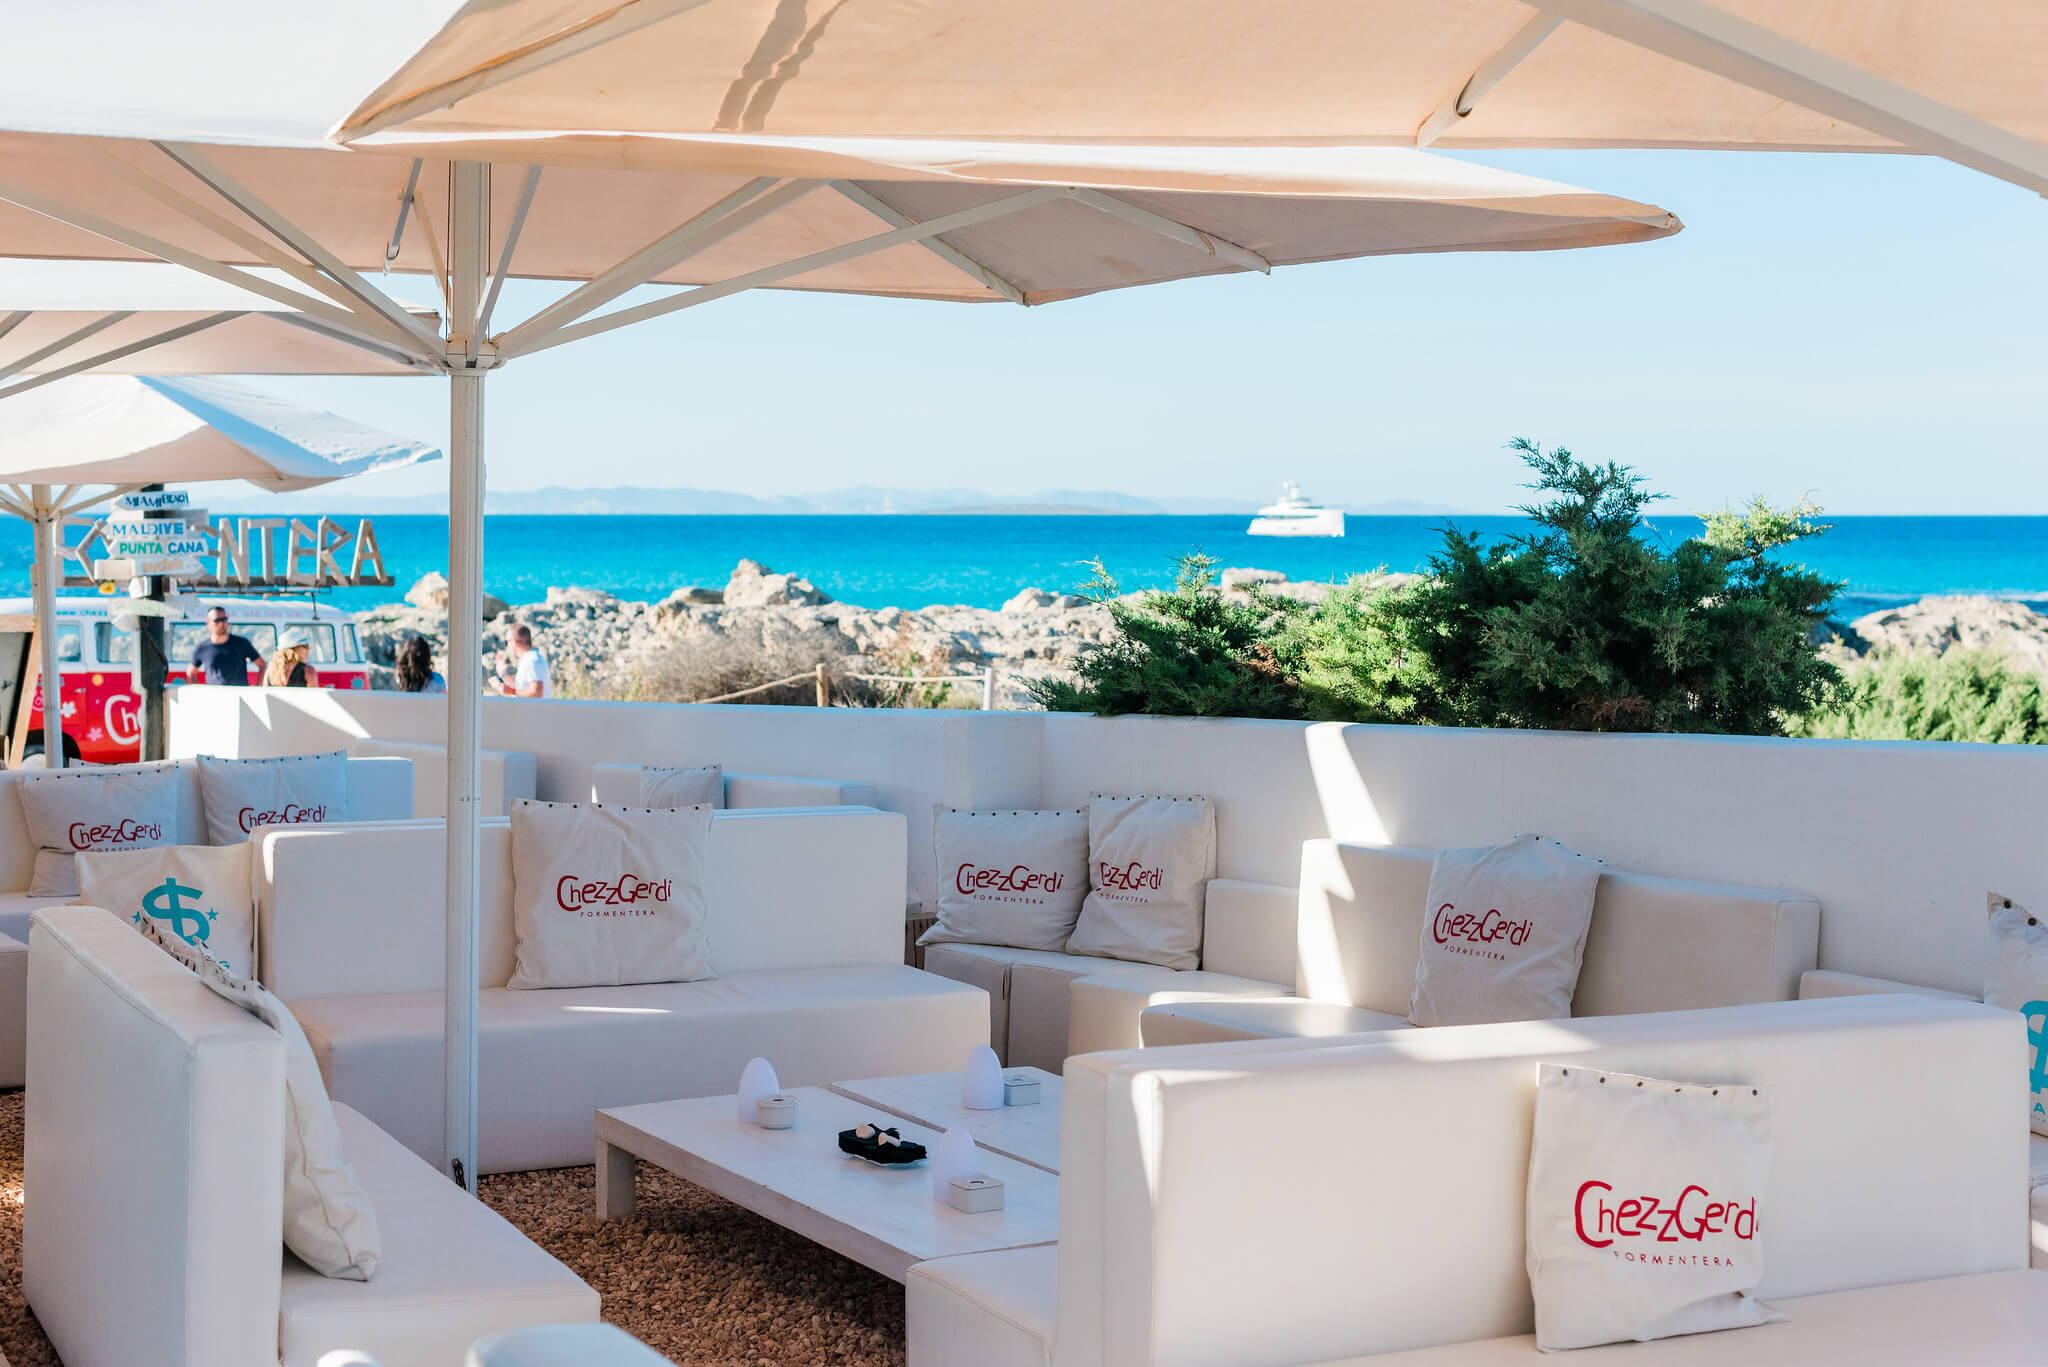 https://www.white-ibiza.com/wp-content/uploads/2020/03/formentera-beach-restaurants-chezz-gerdi-2020-07.jpg